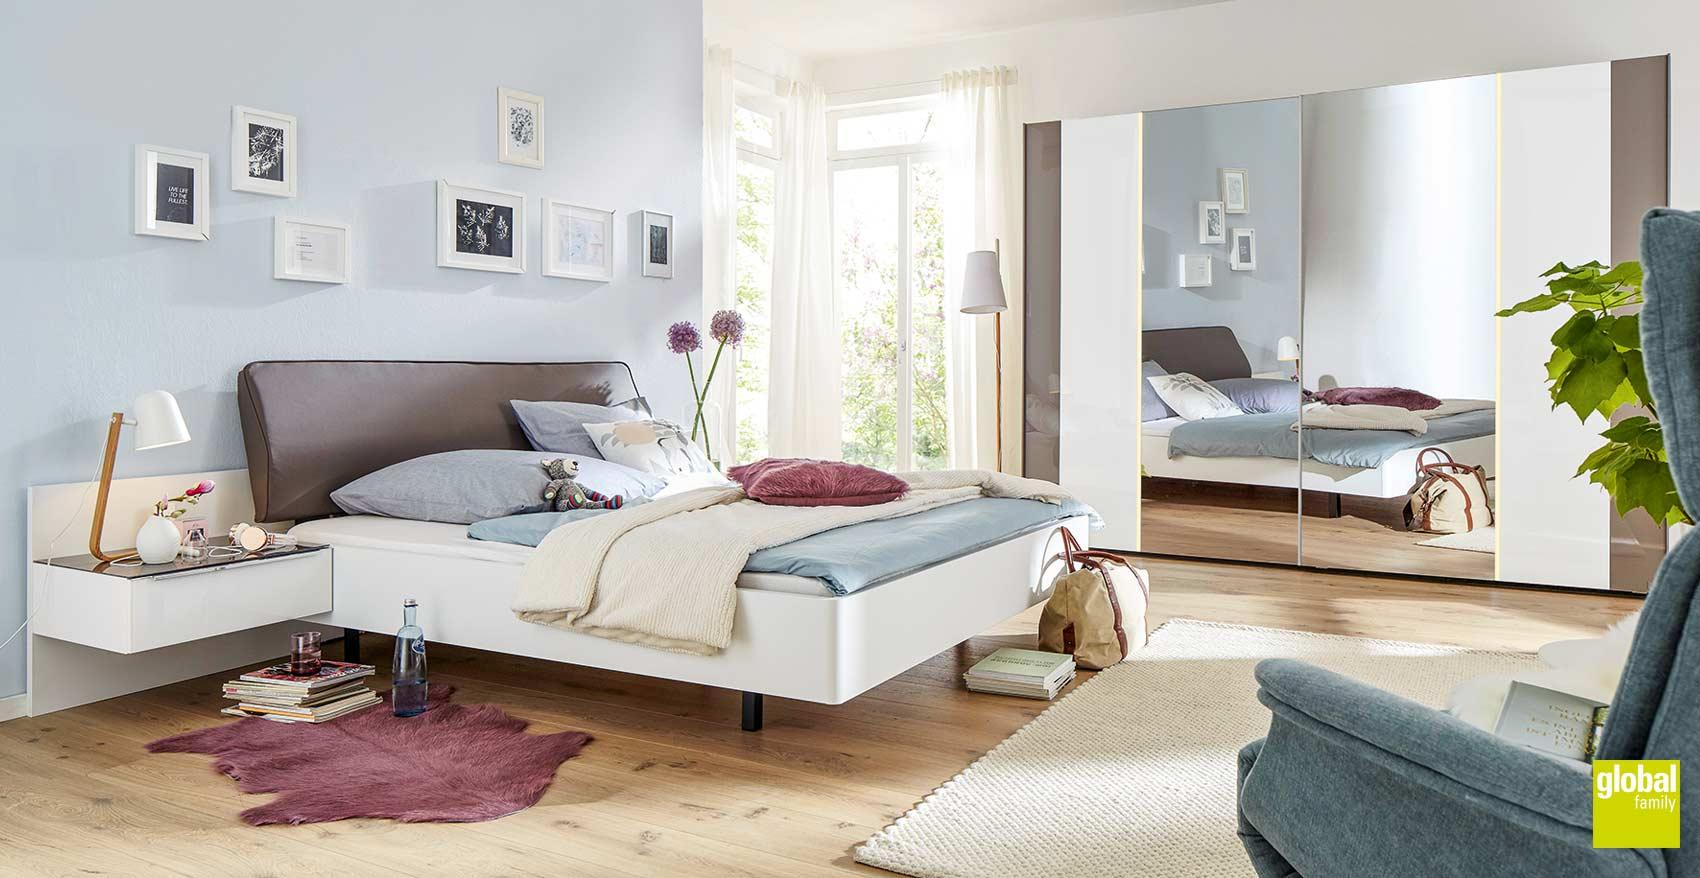 schlafzimmer wohnstories schlafzimmer wohnstories schlafzimmer wohnstories schlafzimmer wohnstories